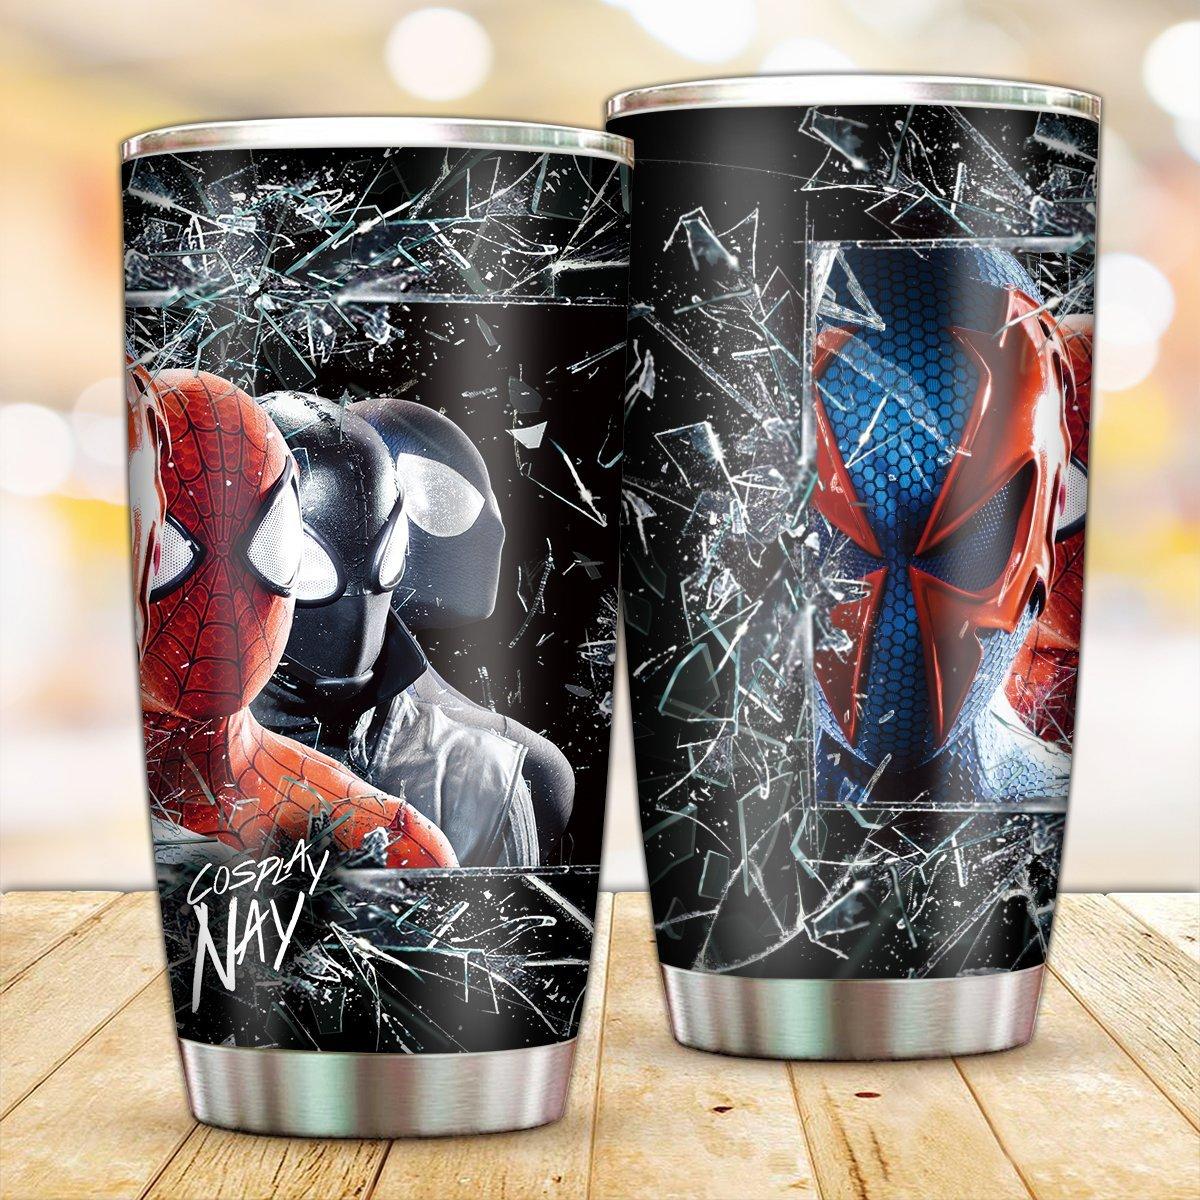 Multiverse Spider-man - Signed Tumbler FDM3009 Default Title Official Otaku Treat Merch